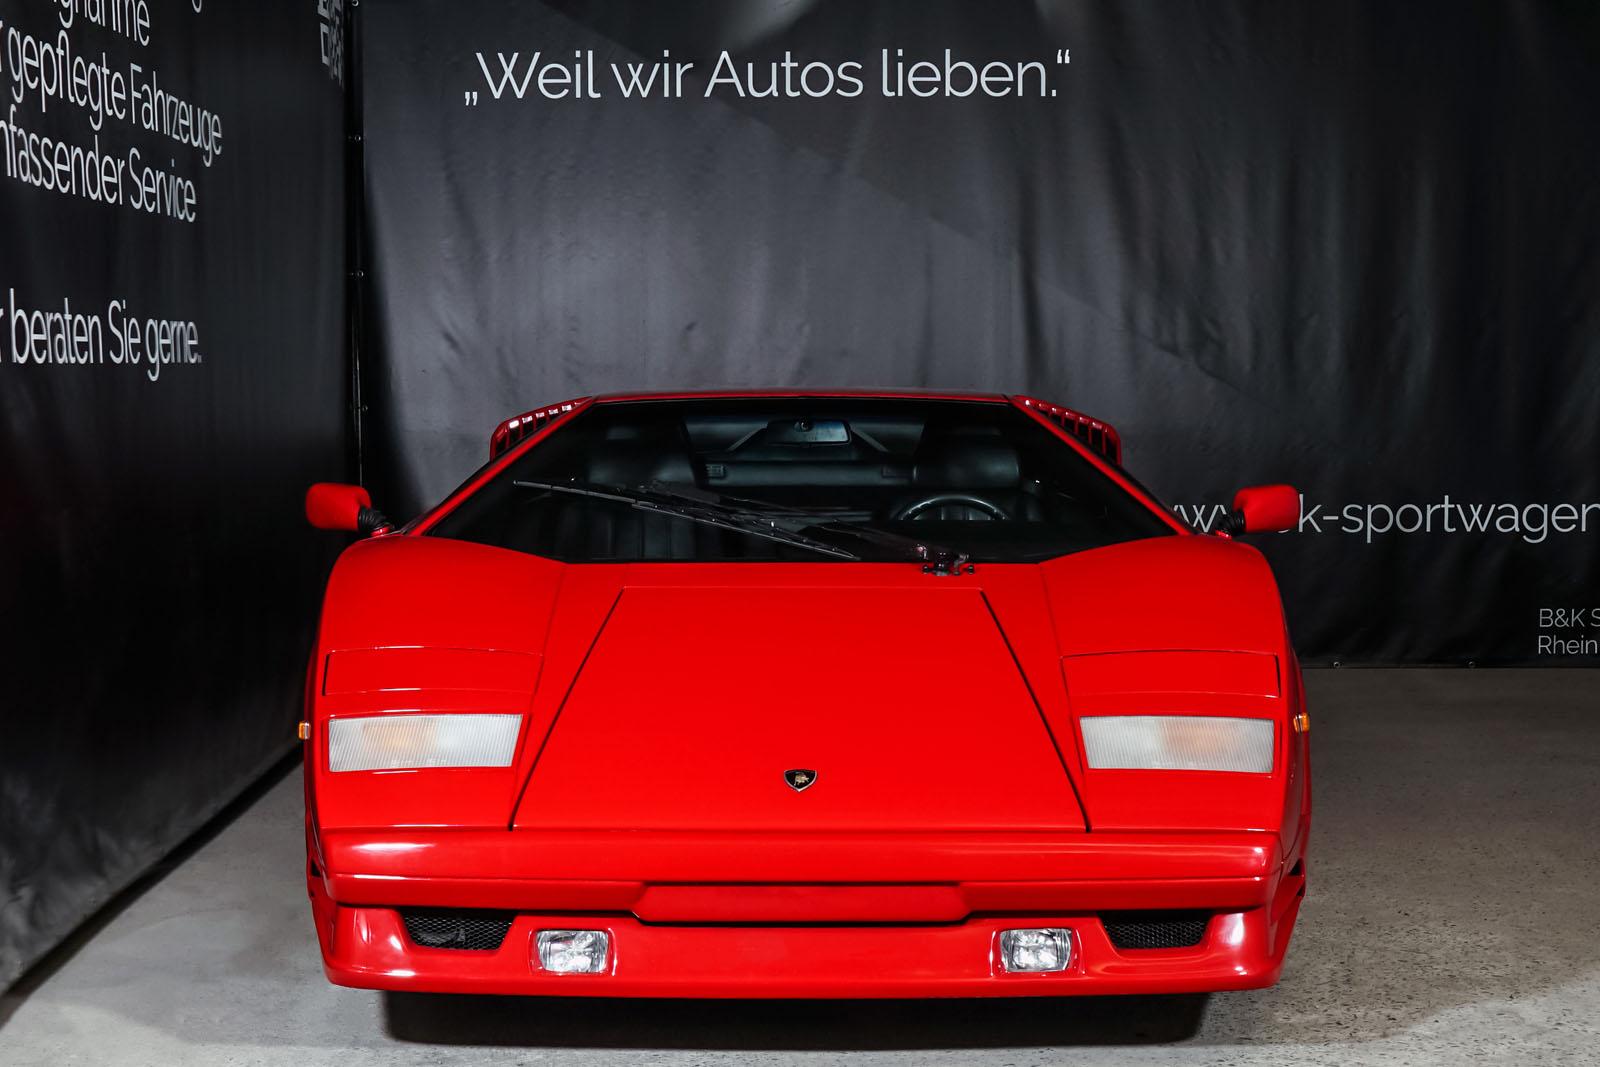 Lamborghini_Countach_Rot_Schwarz_LAM-2811_1_w